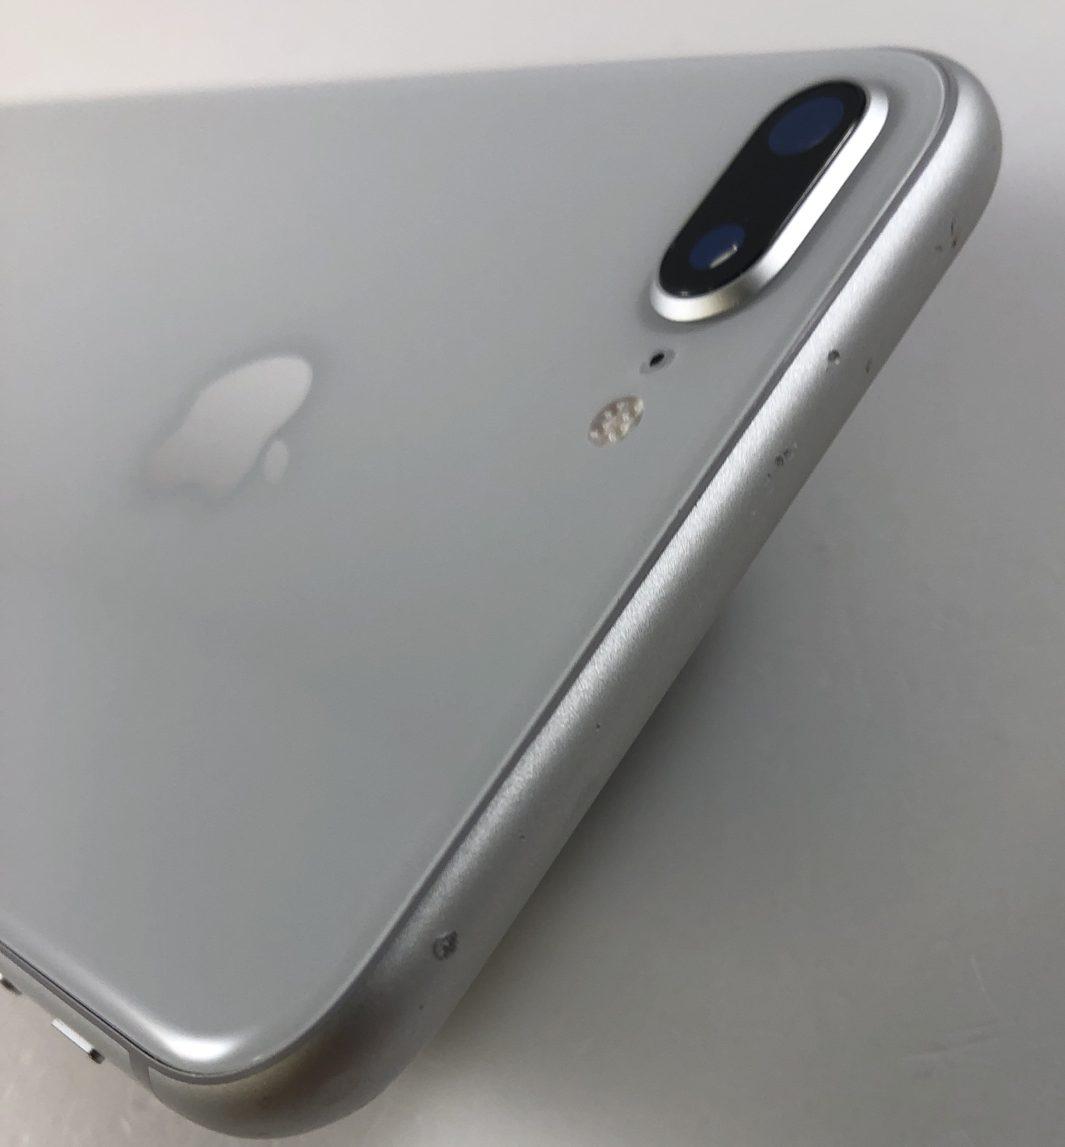 iPhone 8 Plus 64GB, 64GB, Silver, bild 3